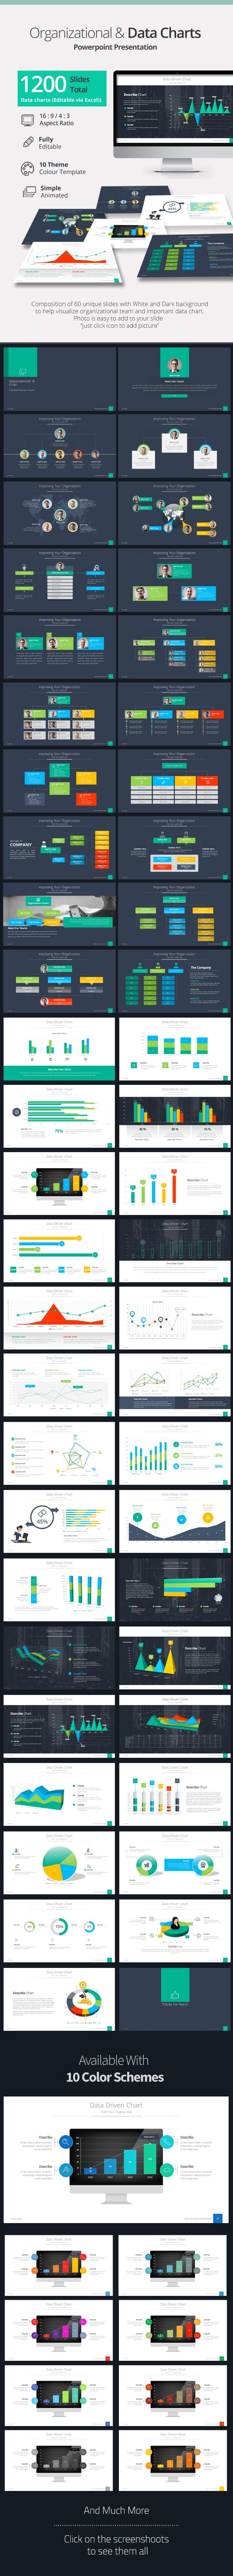 Organizational & Data Chart Presentation PowerPoint Template #slides #design Download: http://graphicriver.net/item/organizational-data-chart-presentation/13649727?ref=ksioks